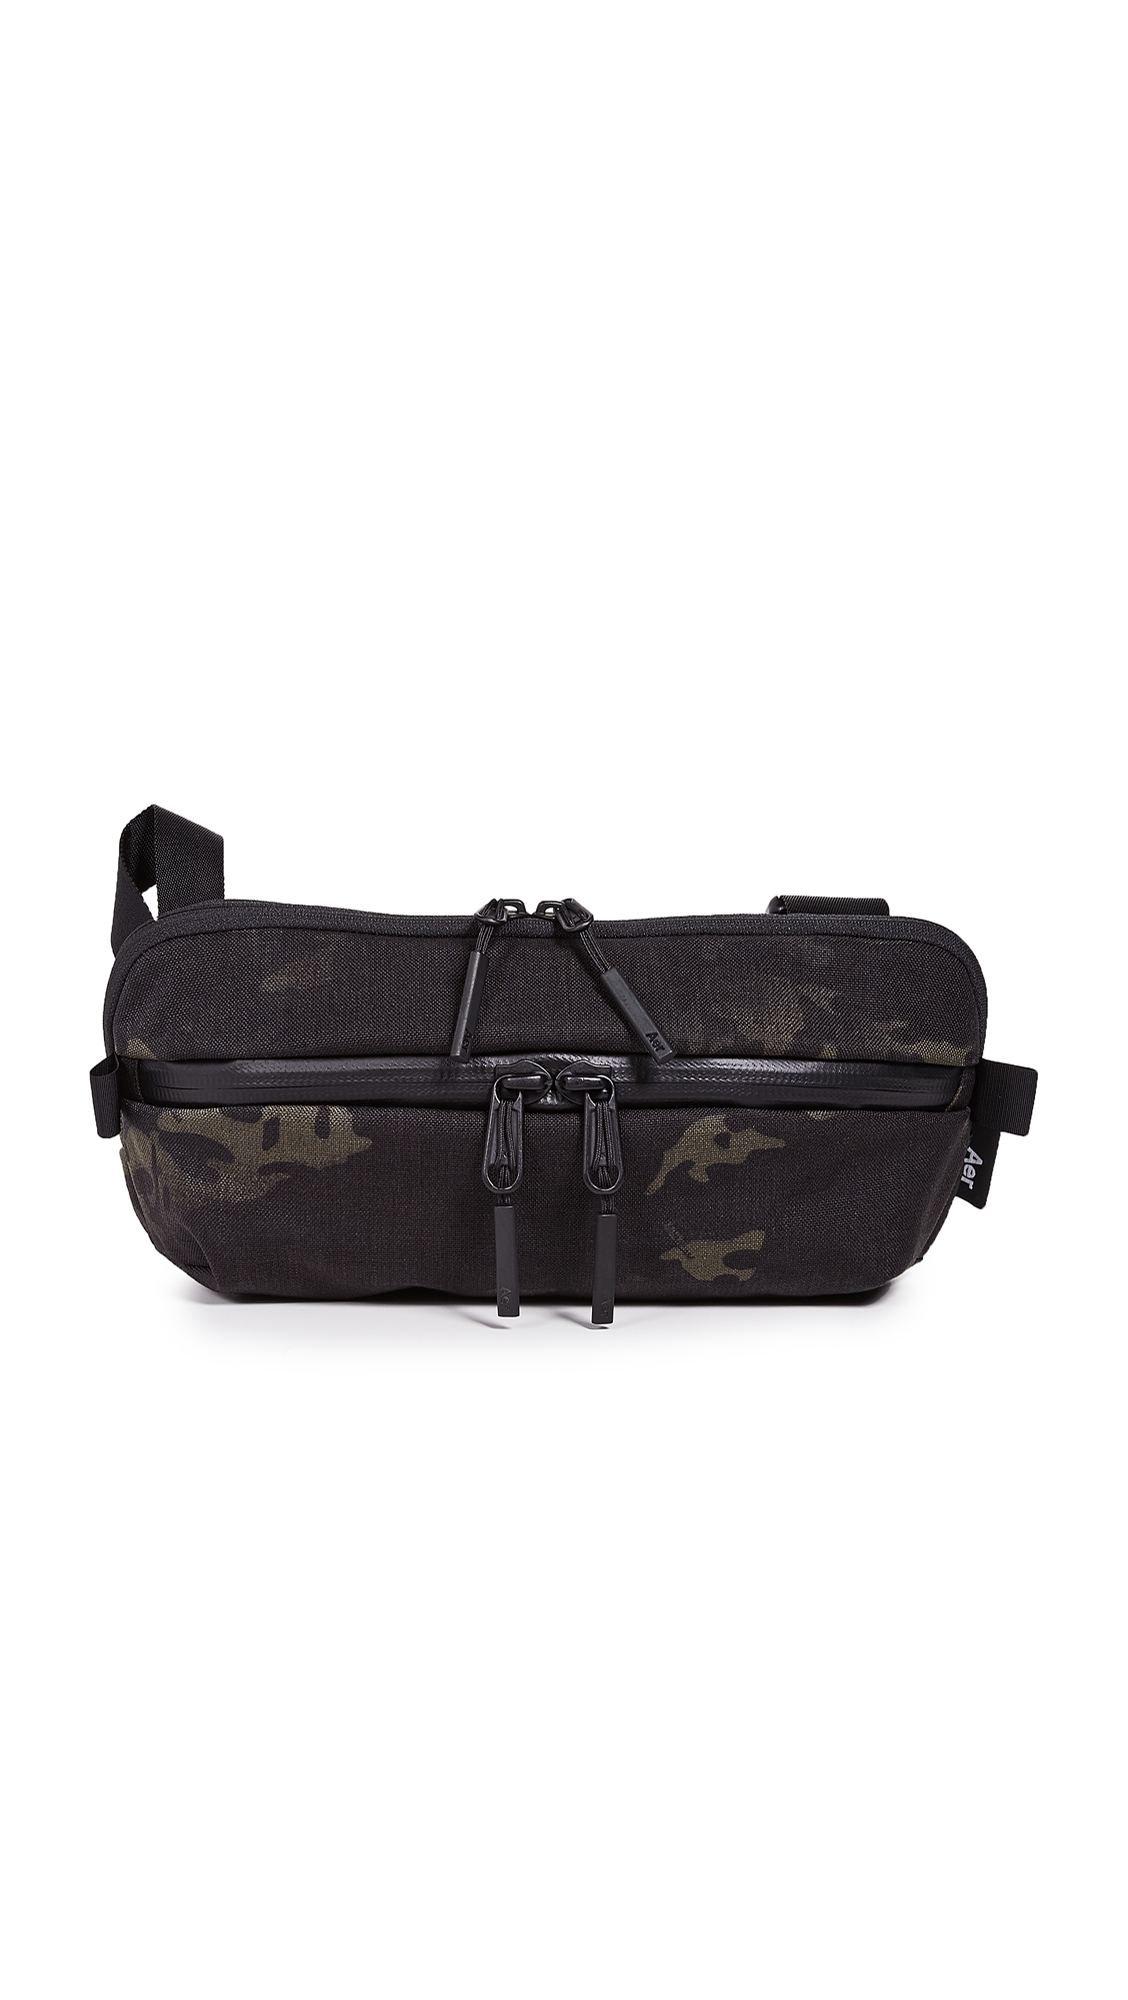 Aer Day Sling Bag In Black Camo   ModeSens b4827766b0